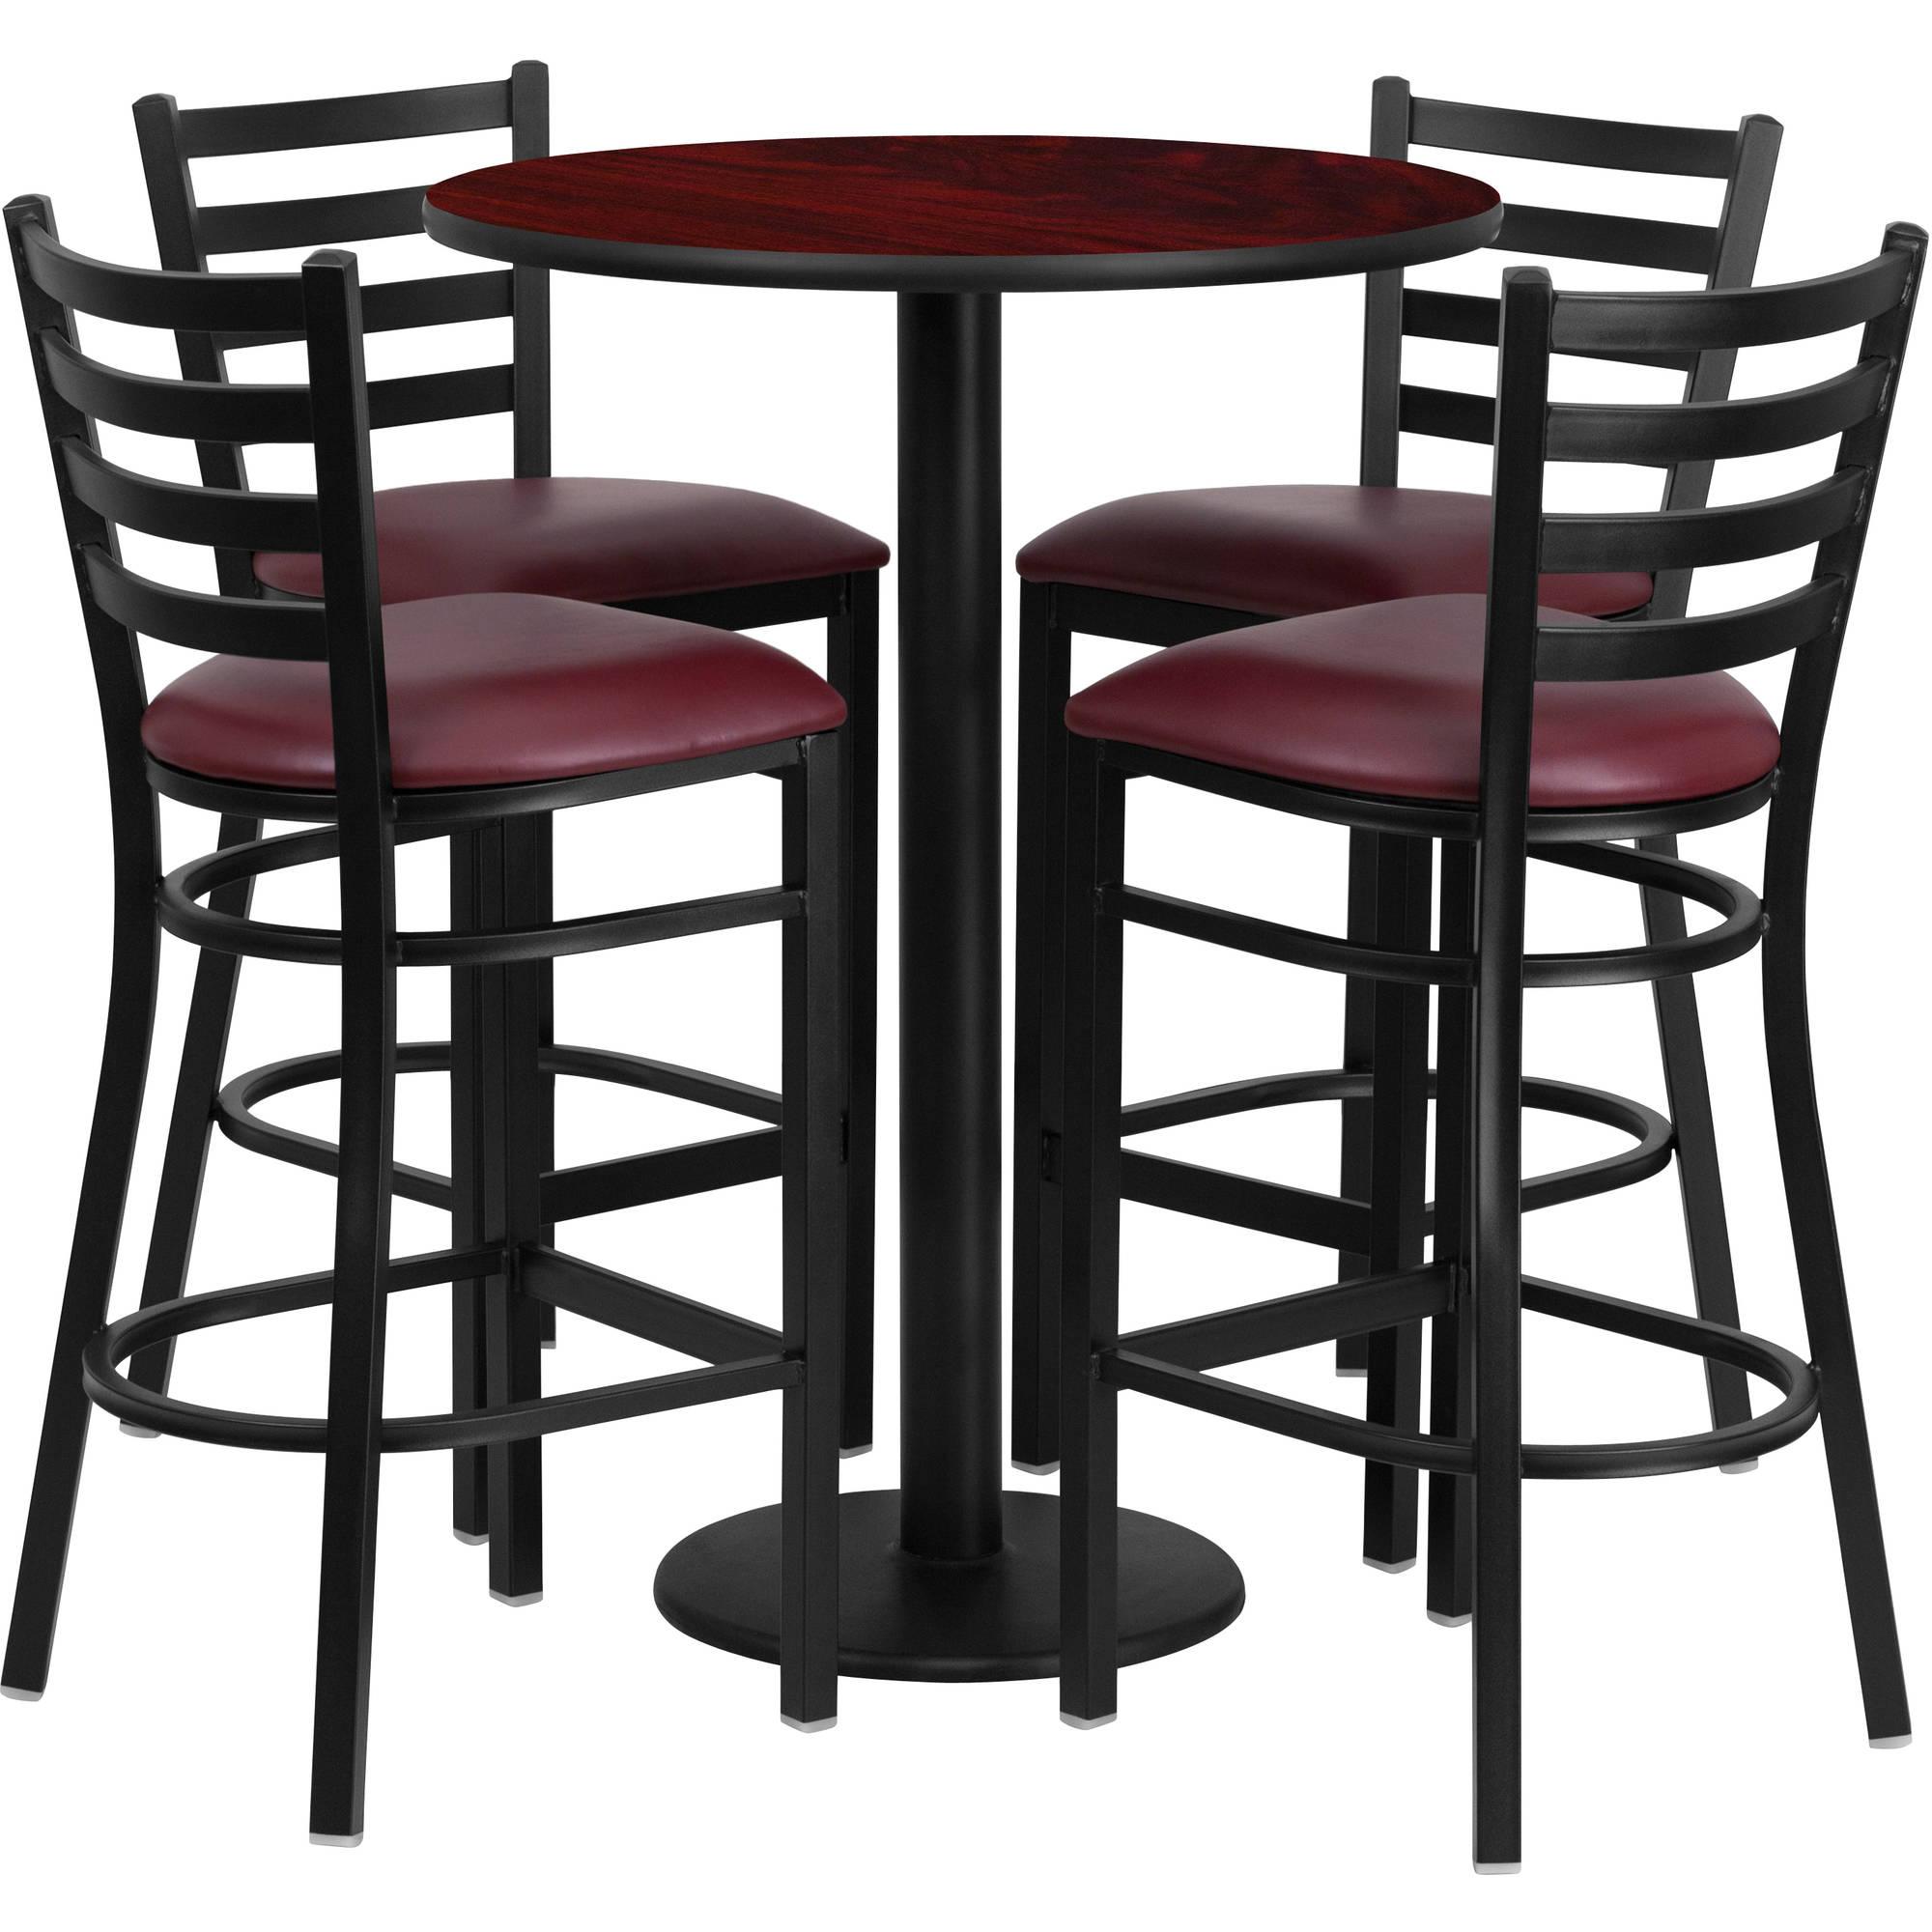 Flash Furniture 30'' Round Mahogany Laminate Table Set with 4 Ladder Back Metal Barstools, Burgundy Vinyl Seat